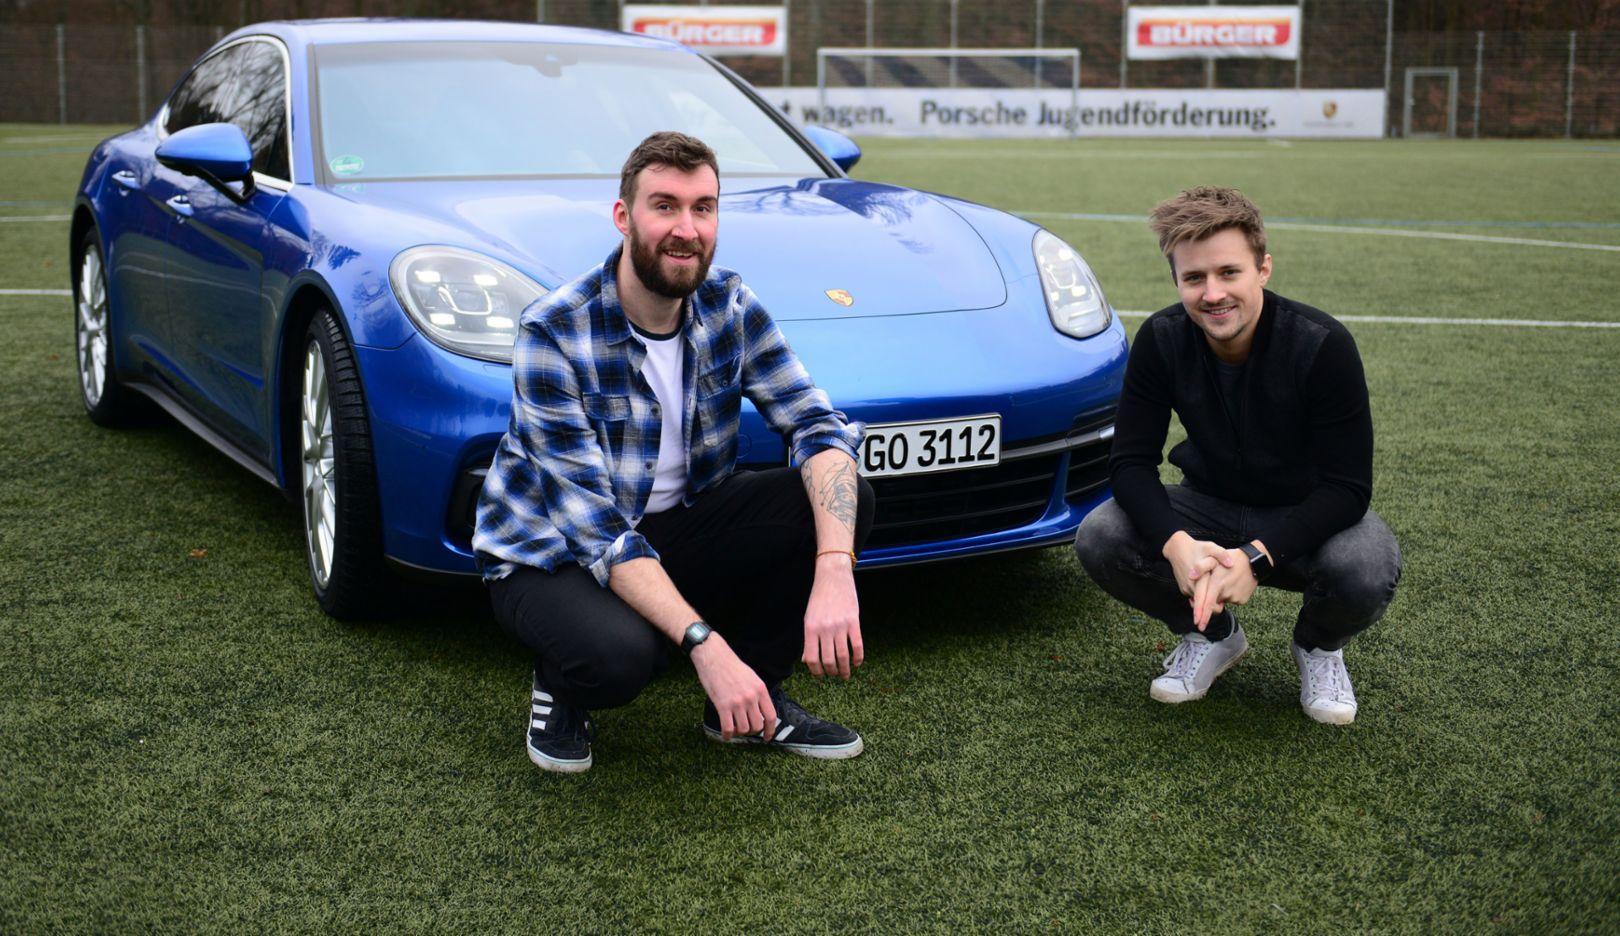 Markus Hermann, Marvin Ronsdorf, l-r, sport bloggers, Panamera 4S, Stuttgart, 2017, Porsche AG